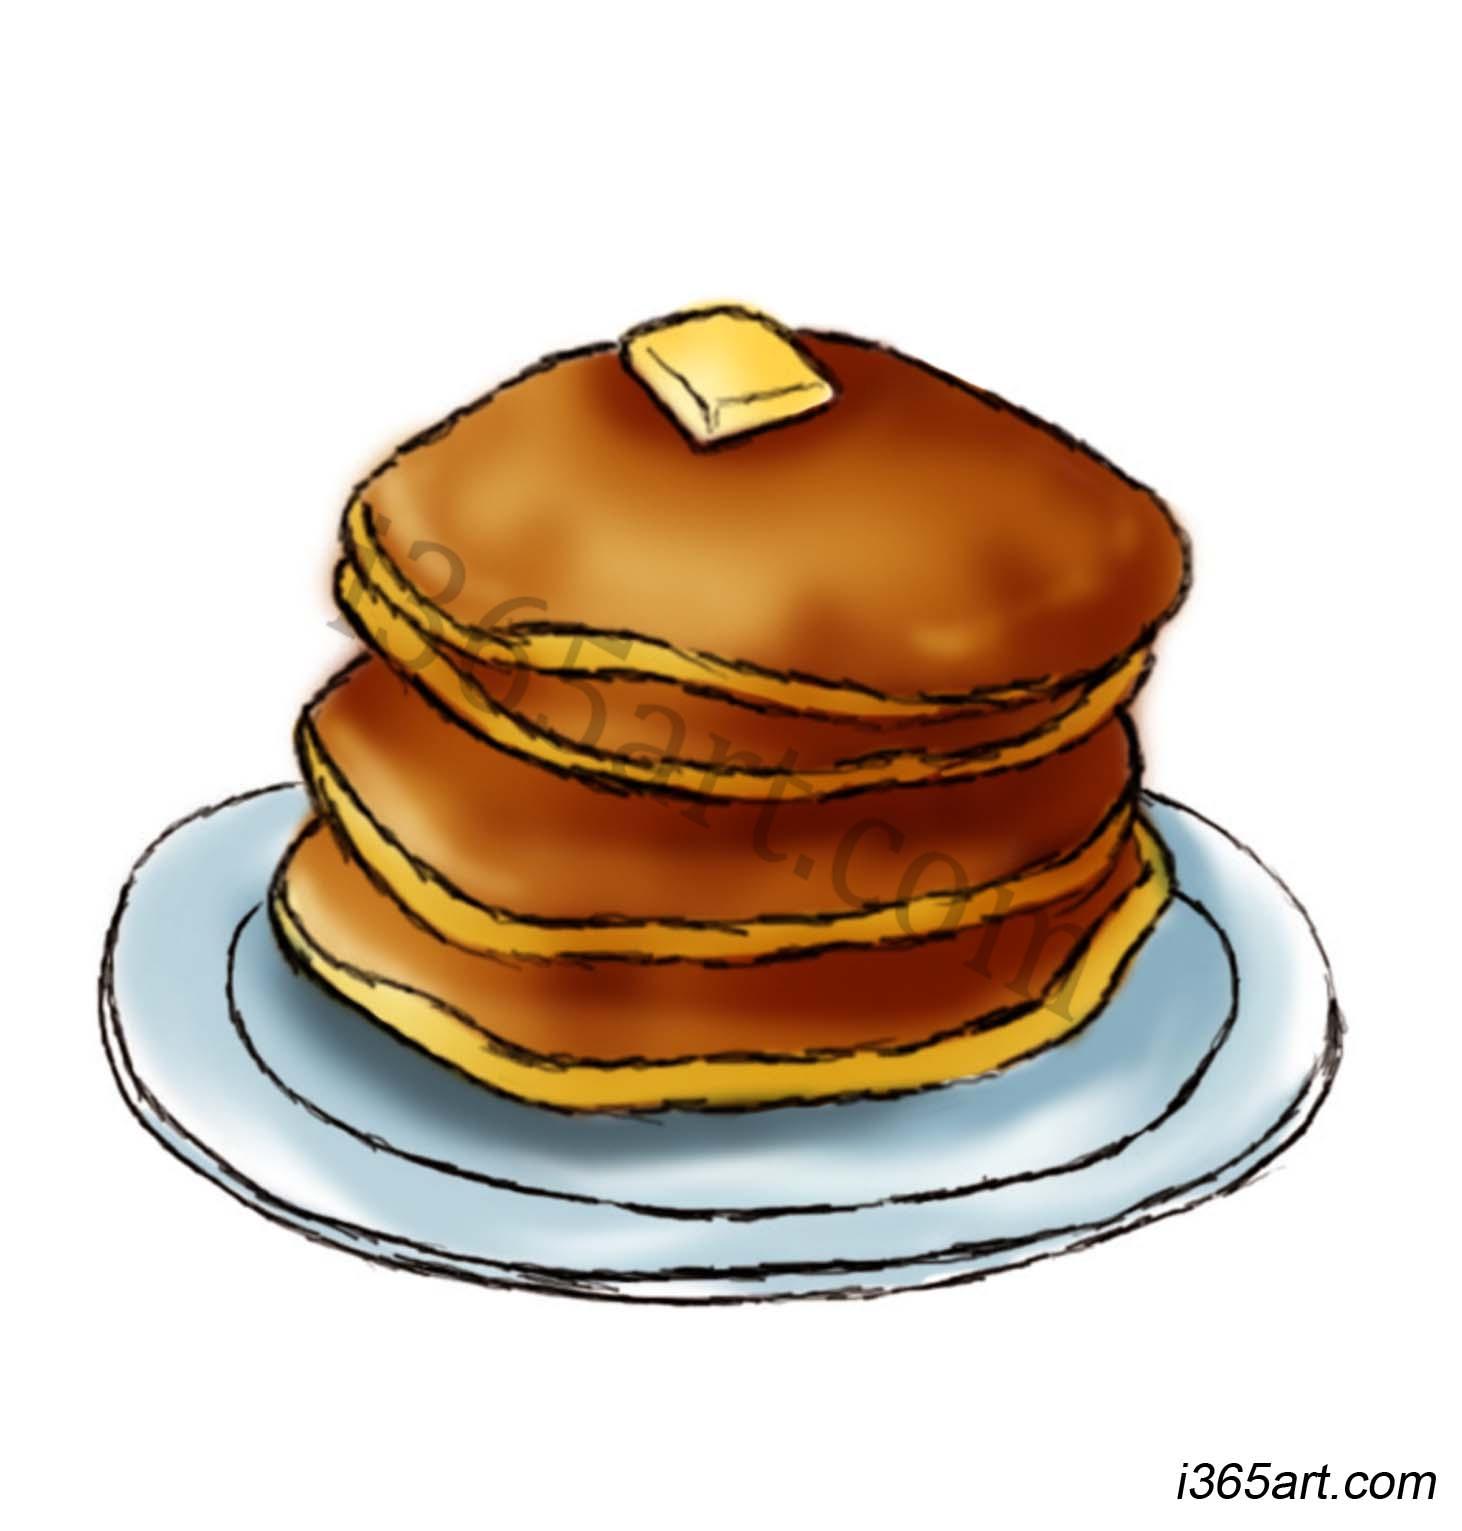 Flapjack Pancakes